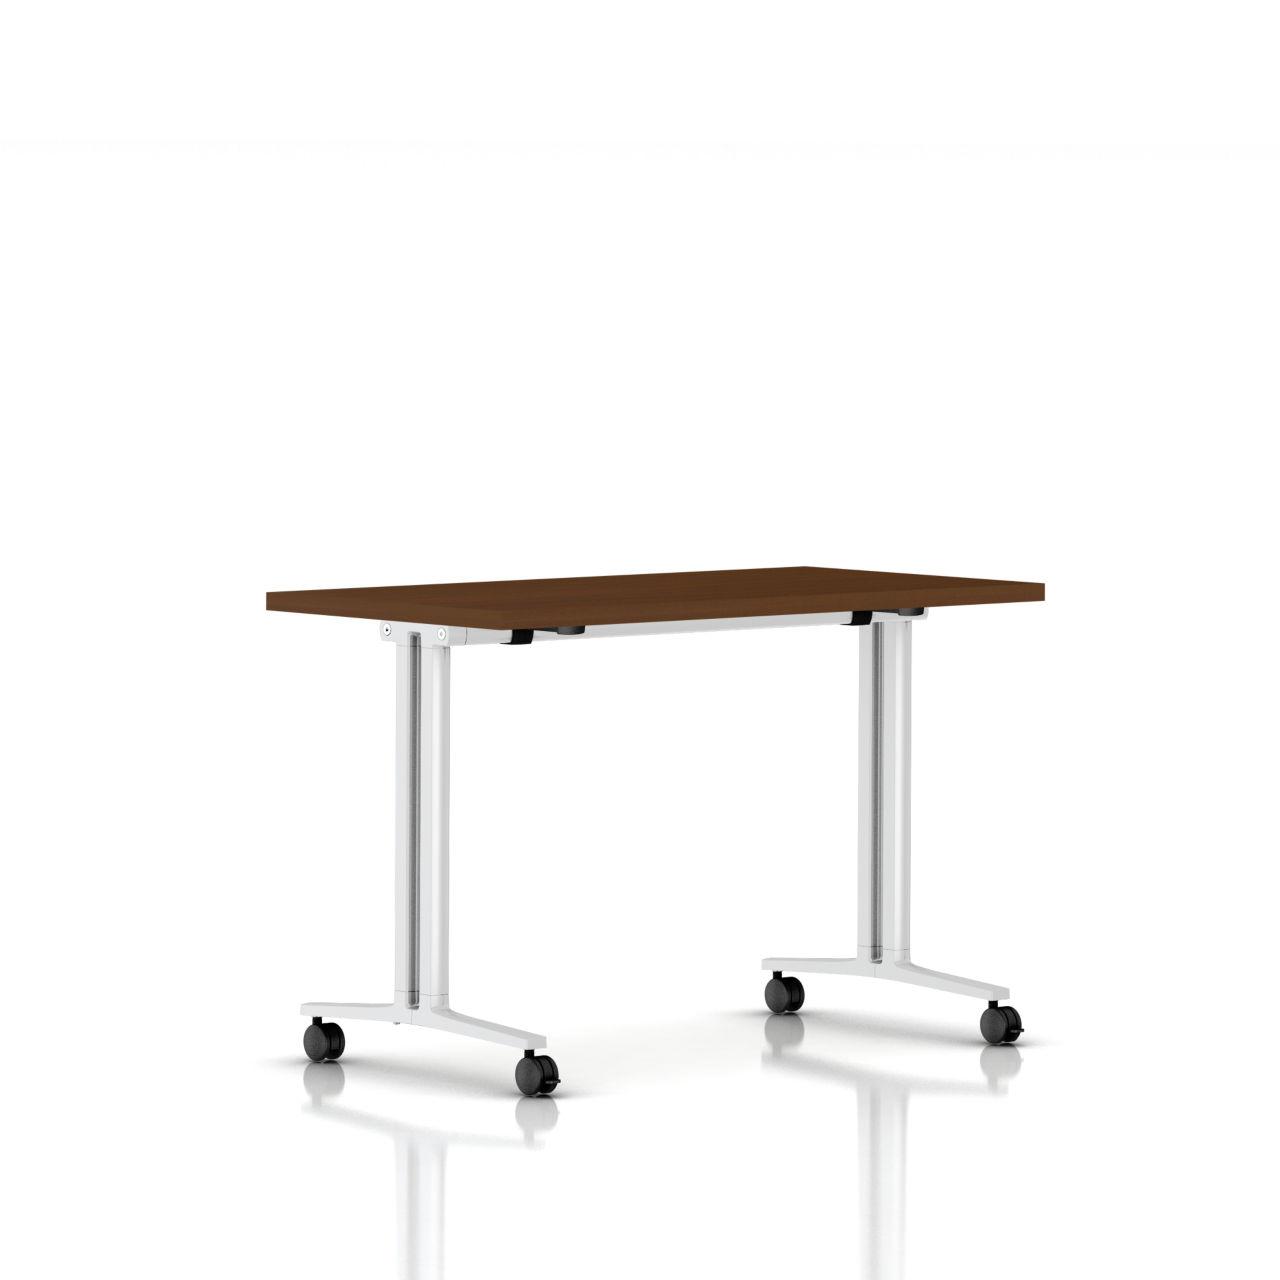 Flip Top Everywhere Table in Light Brown Walnut 48 in Wide by Herman Miller